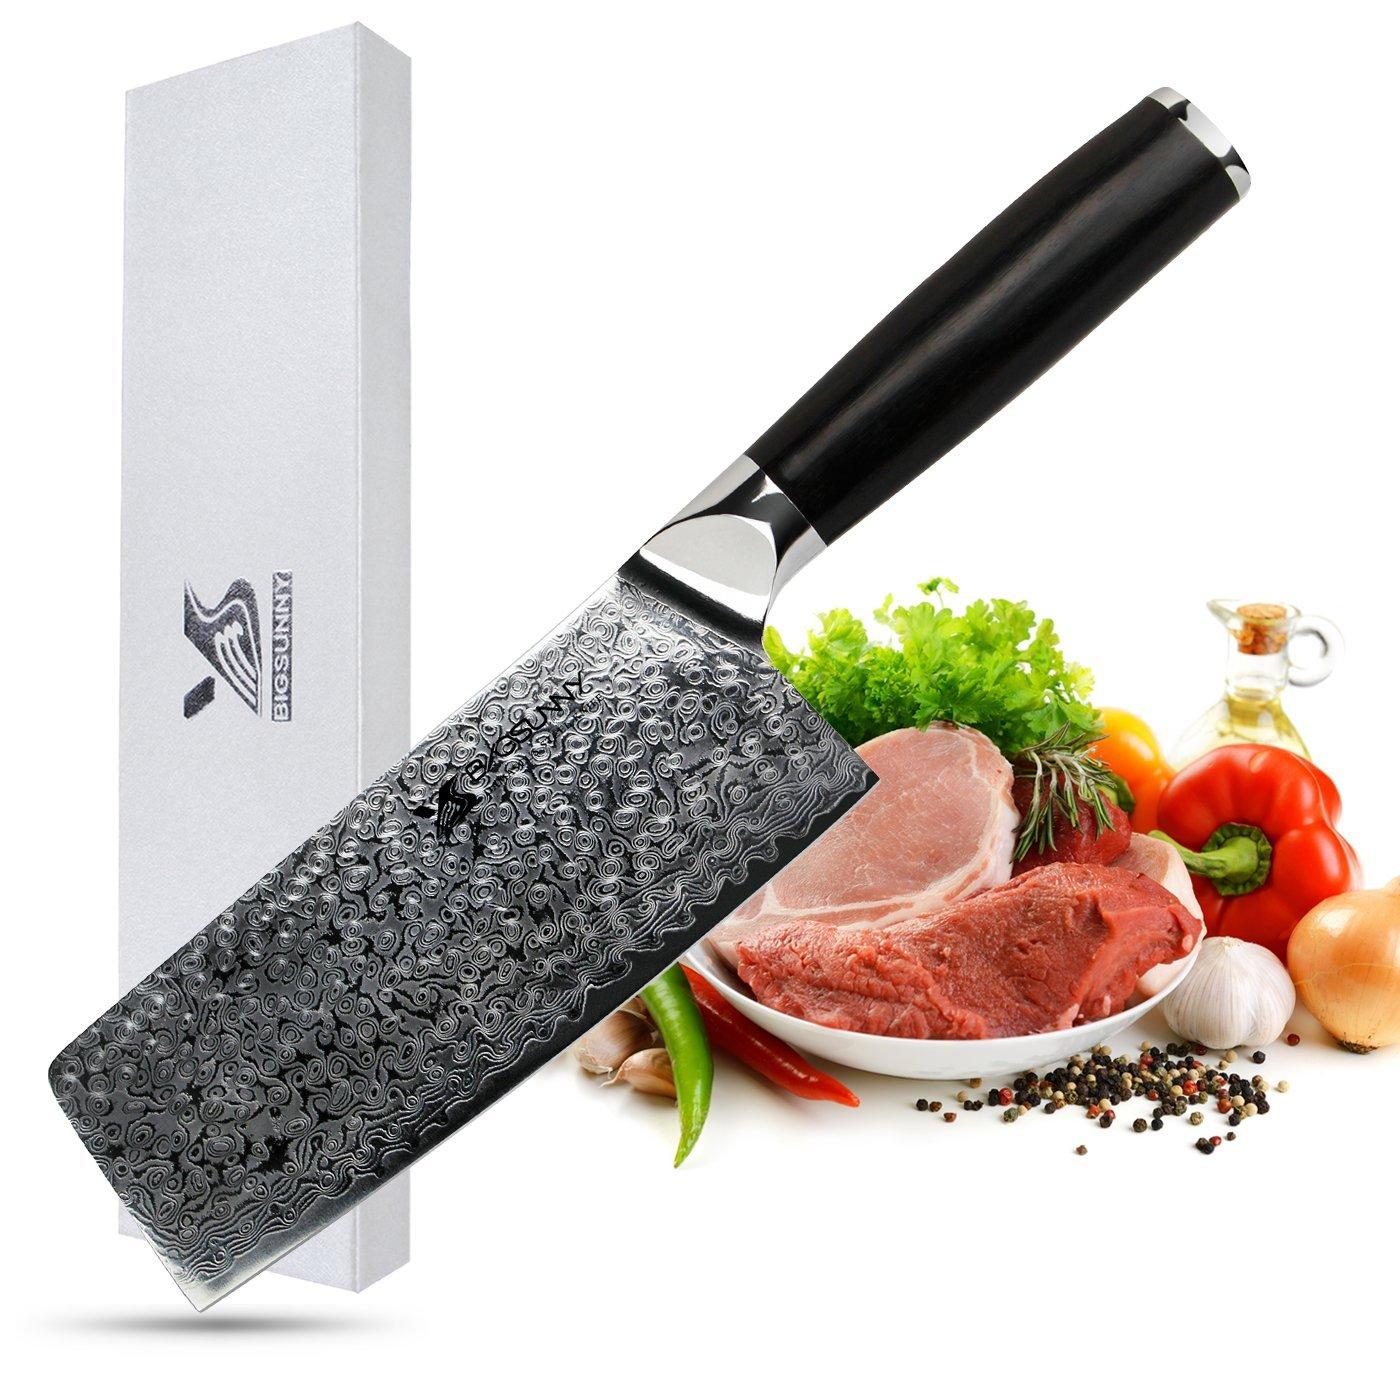 MSY BIGSUNNY 6.6 inch Butcher Knife 67 Layers Damascus Steel Slicing knife Nakiri Knife Chinese Cleaver with Ebony Handle